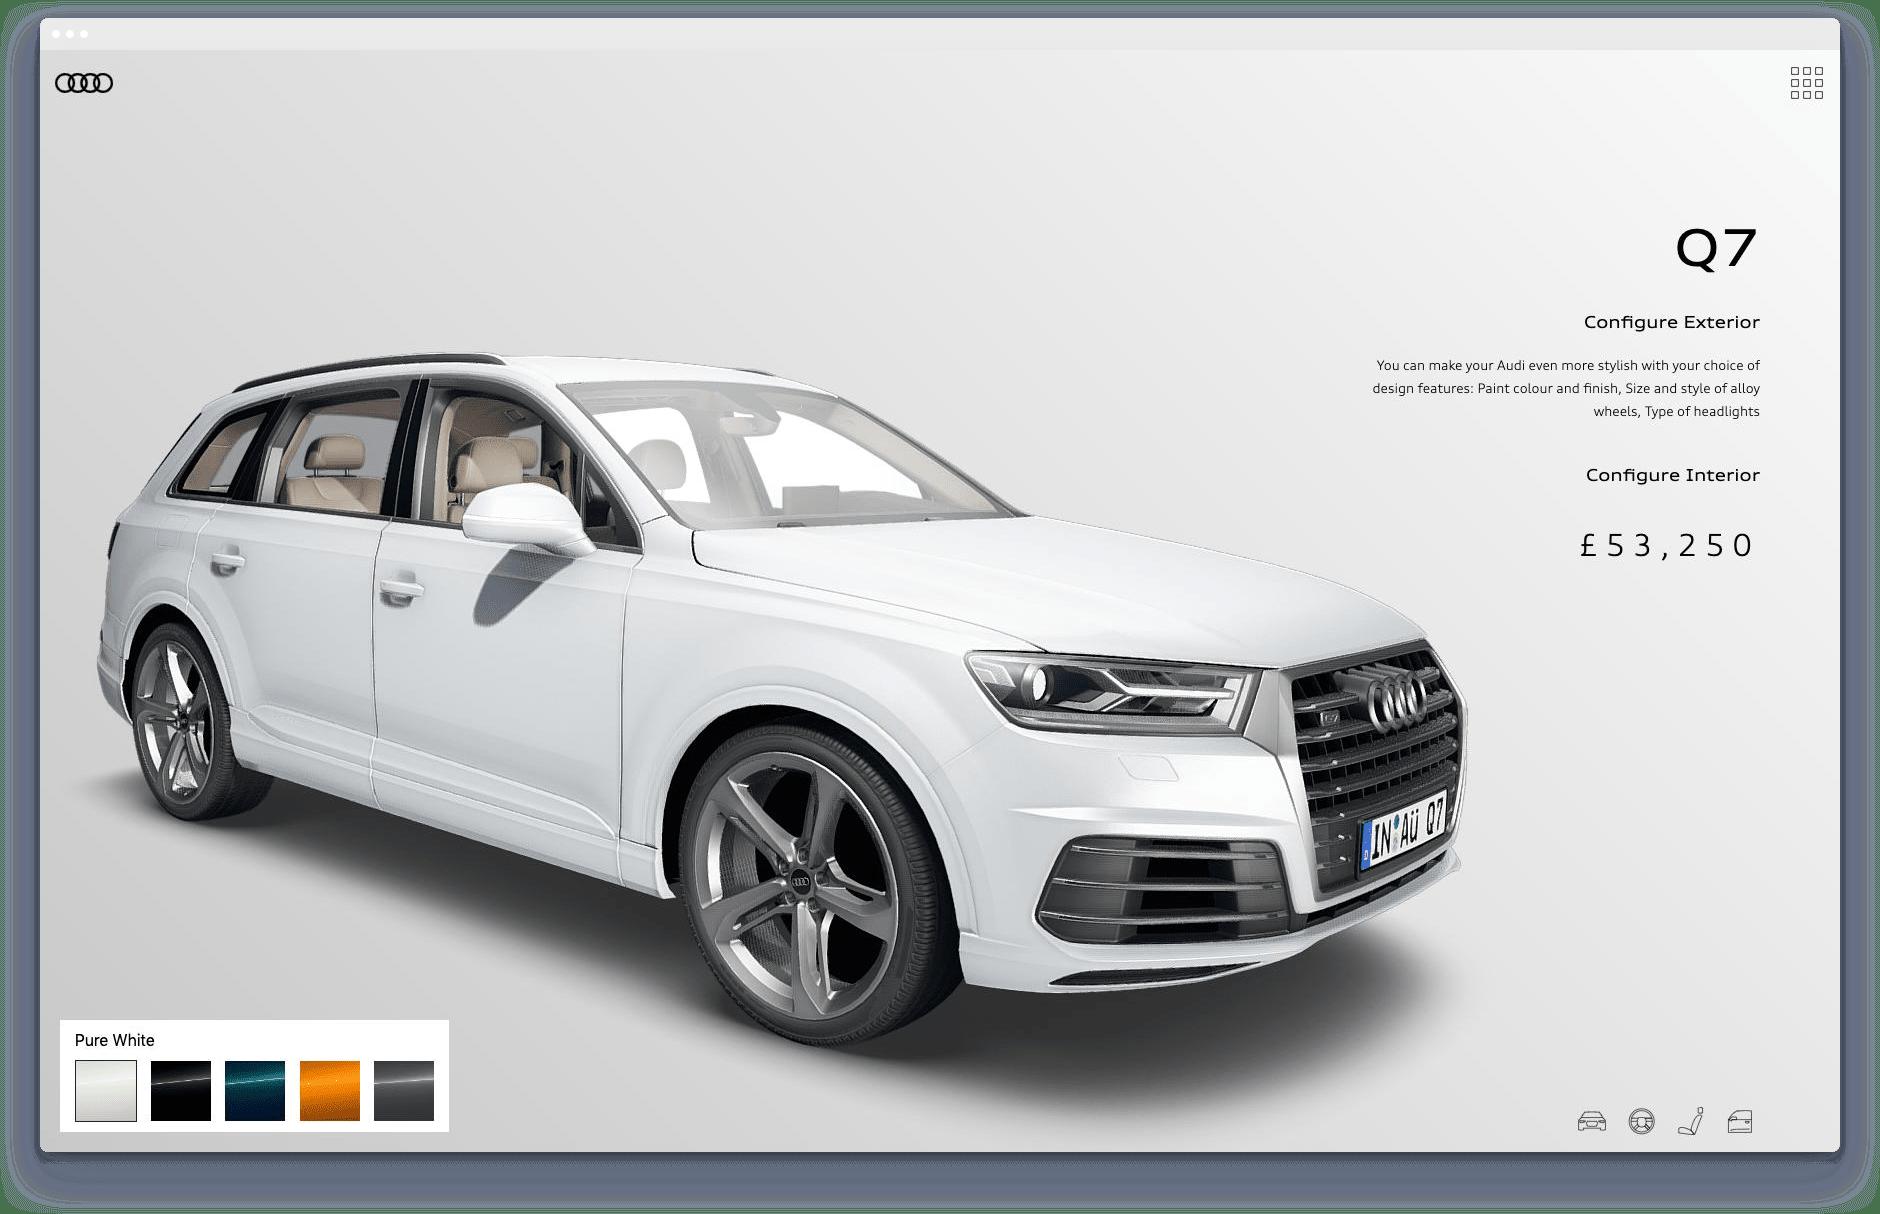 Audi configurator